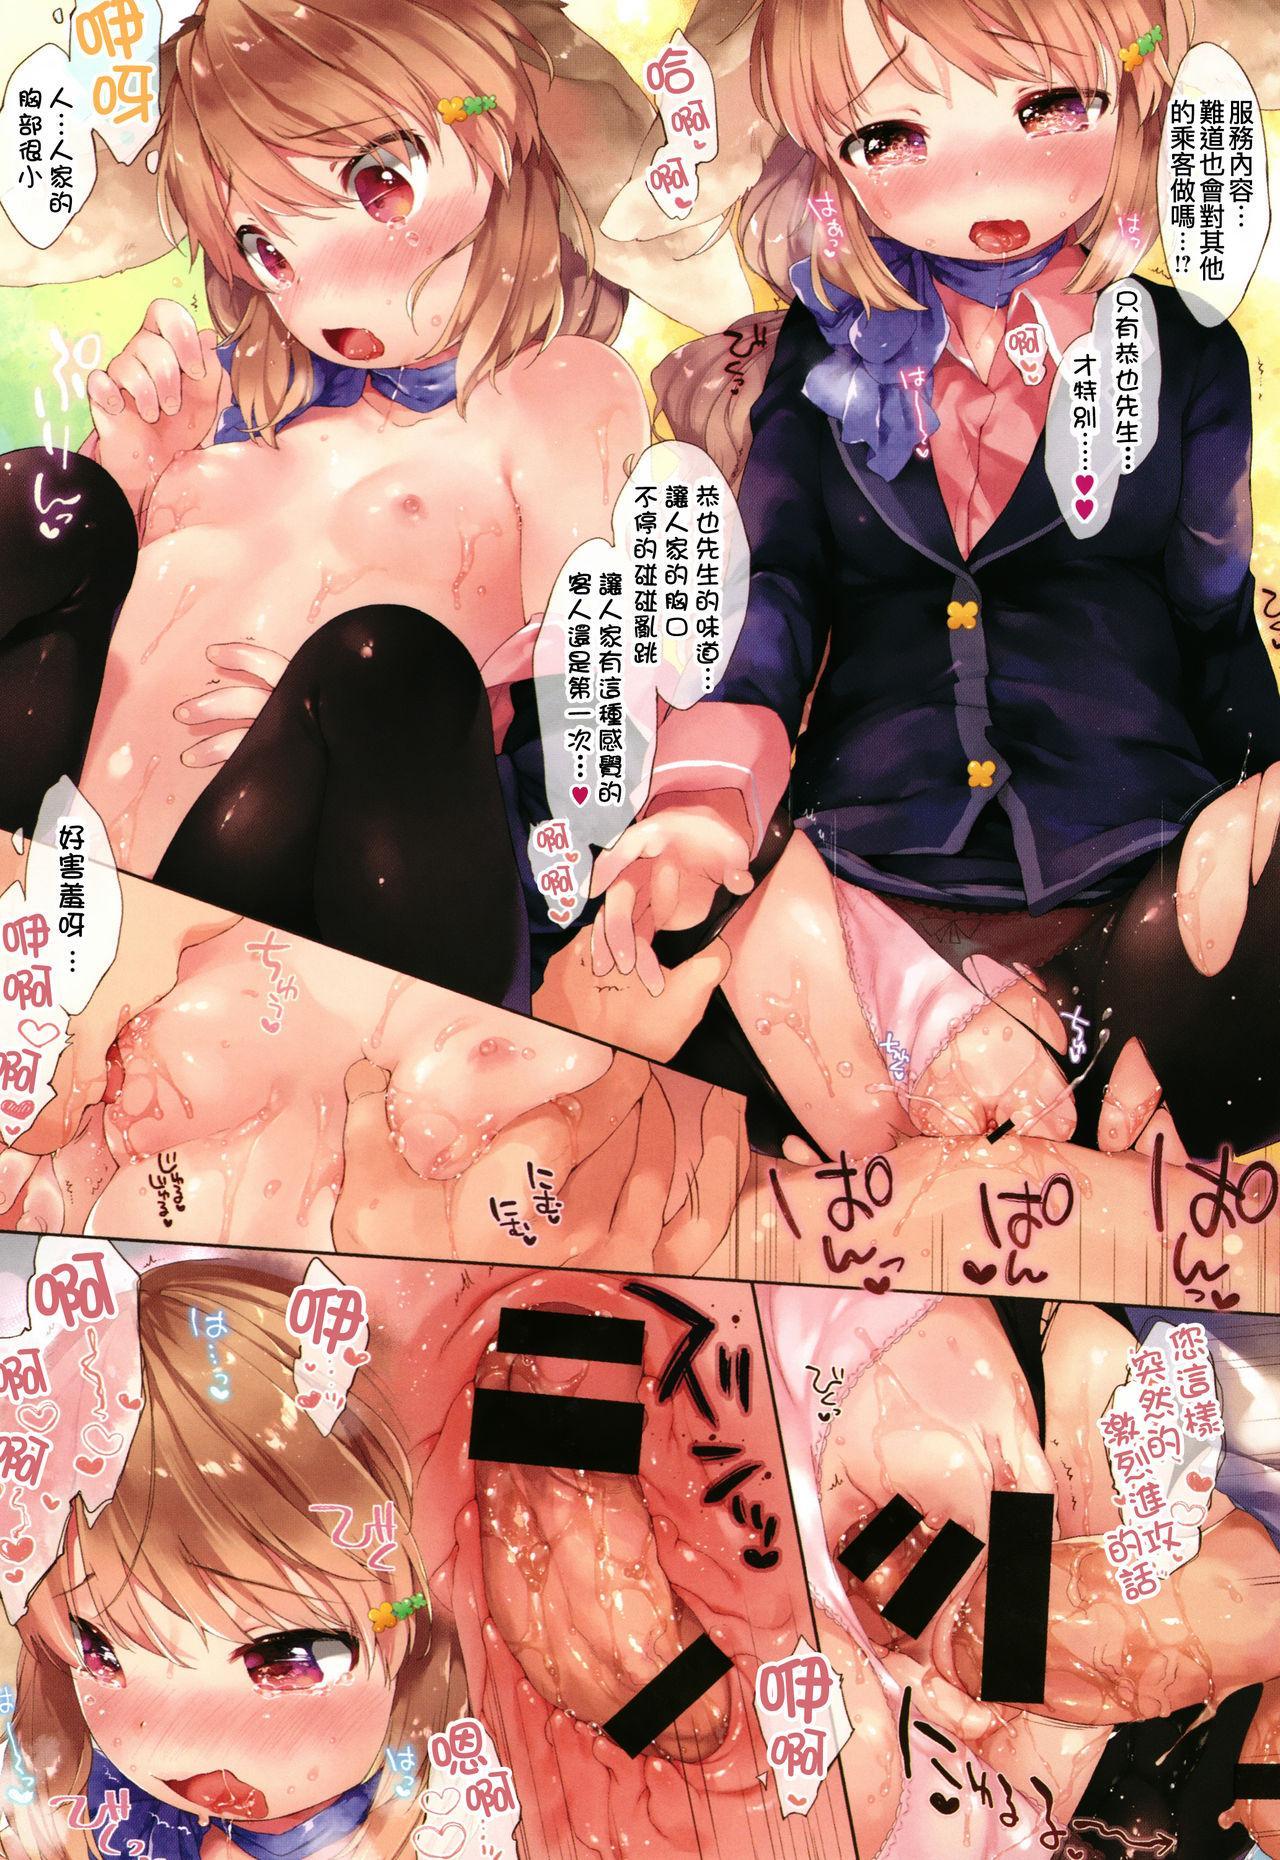 Koakuma wa Shoudoubutsu - Sweet devils as my pets. 7